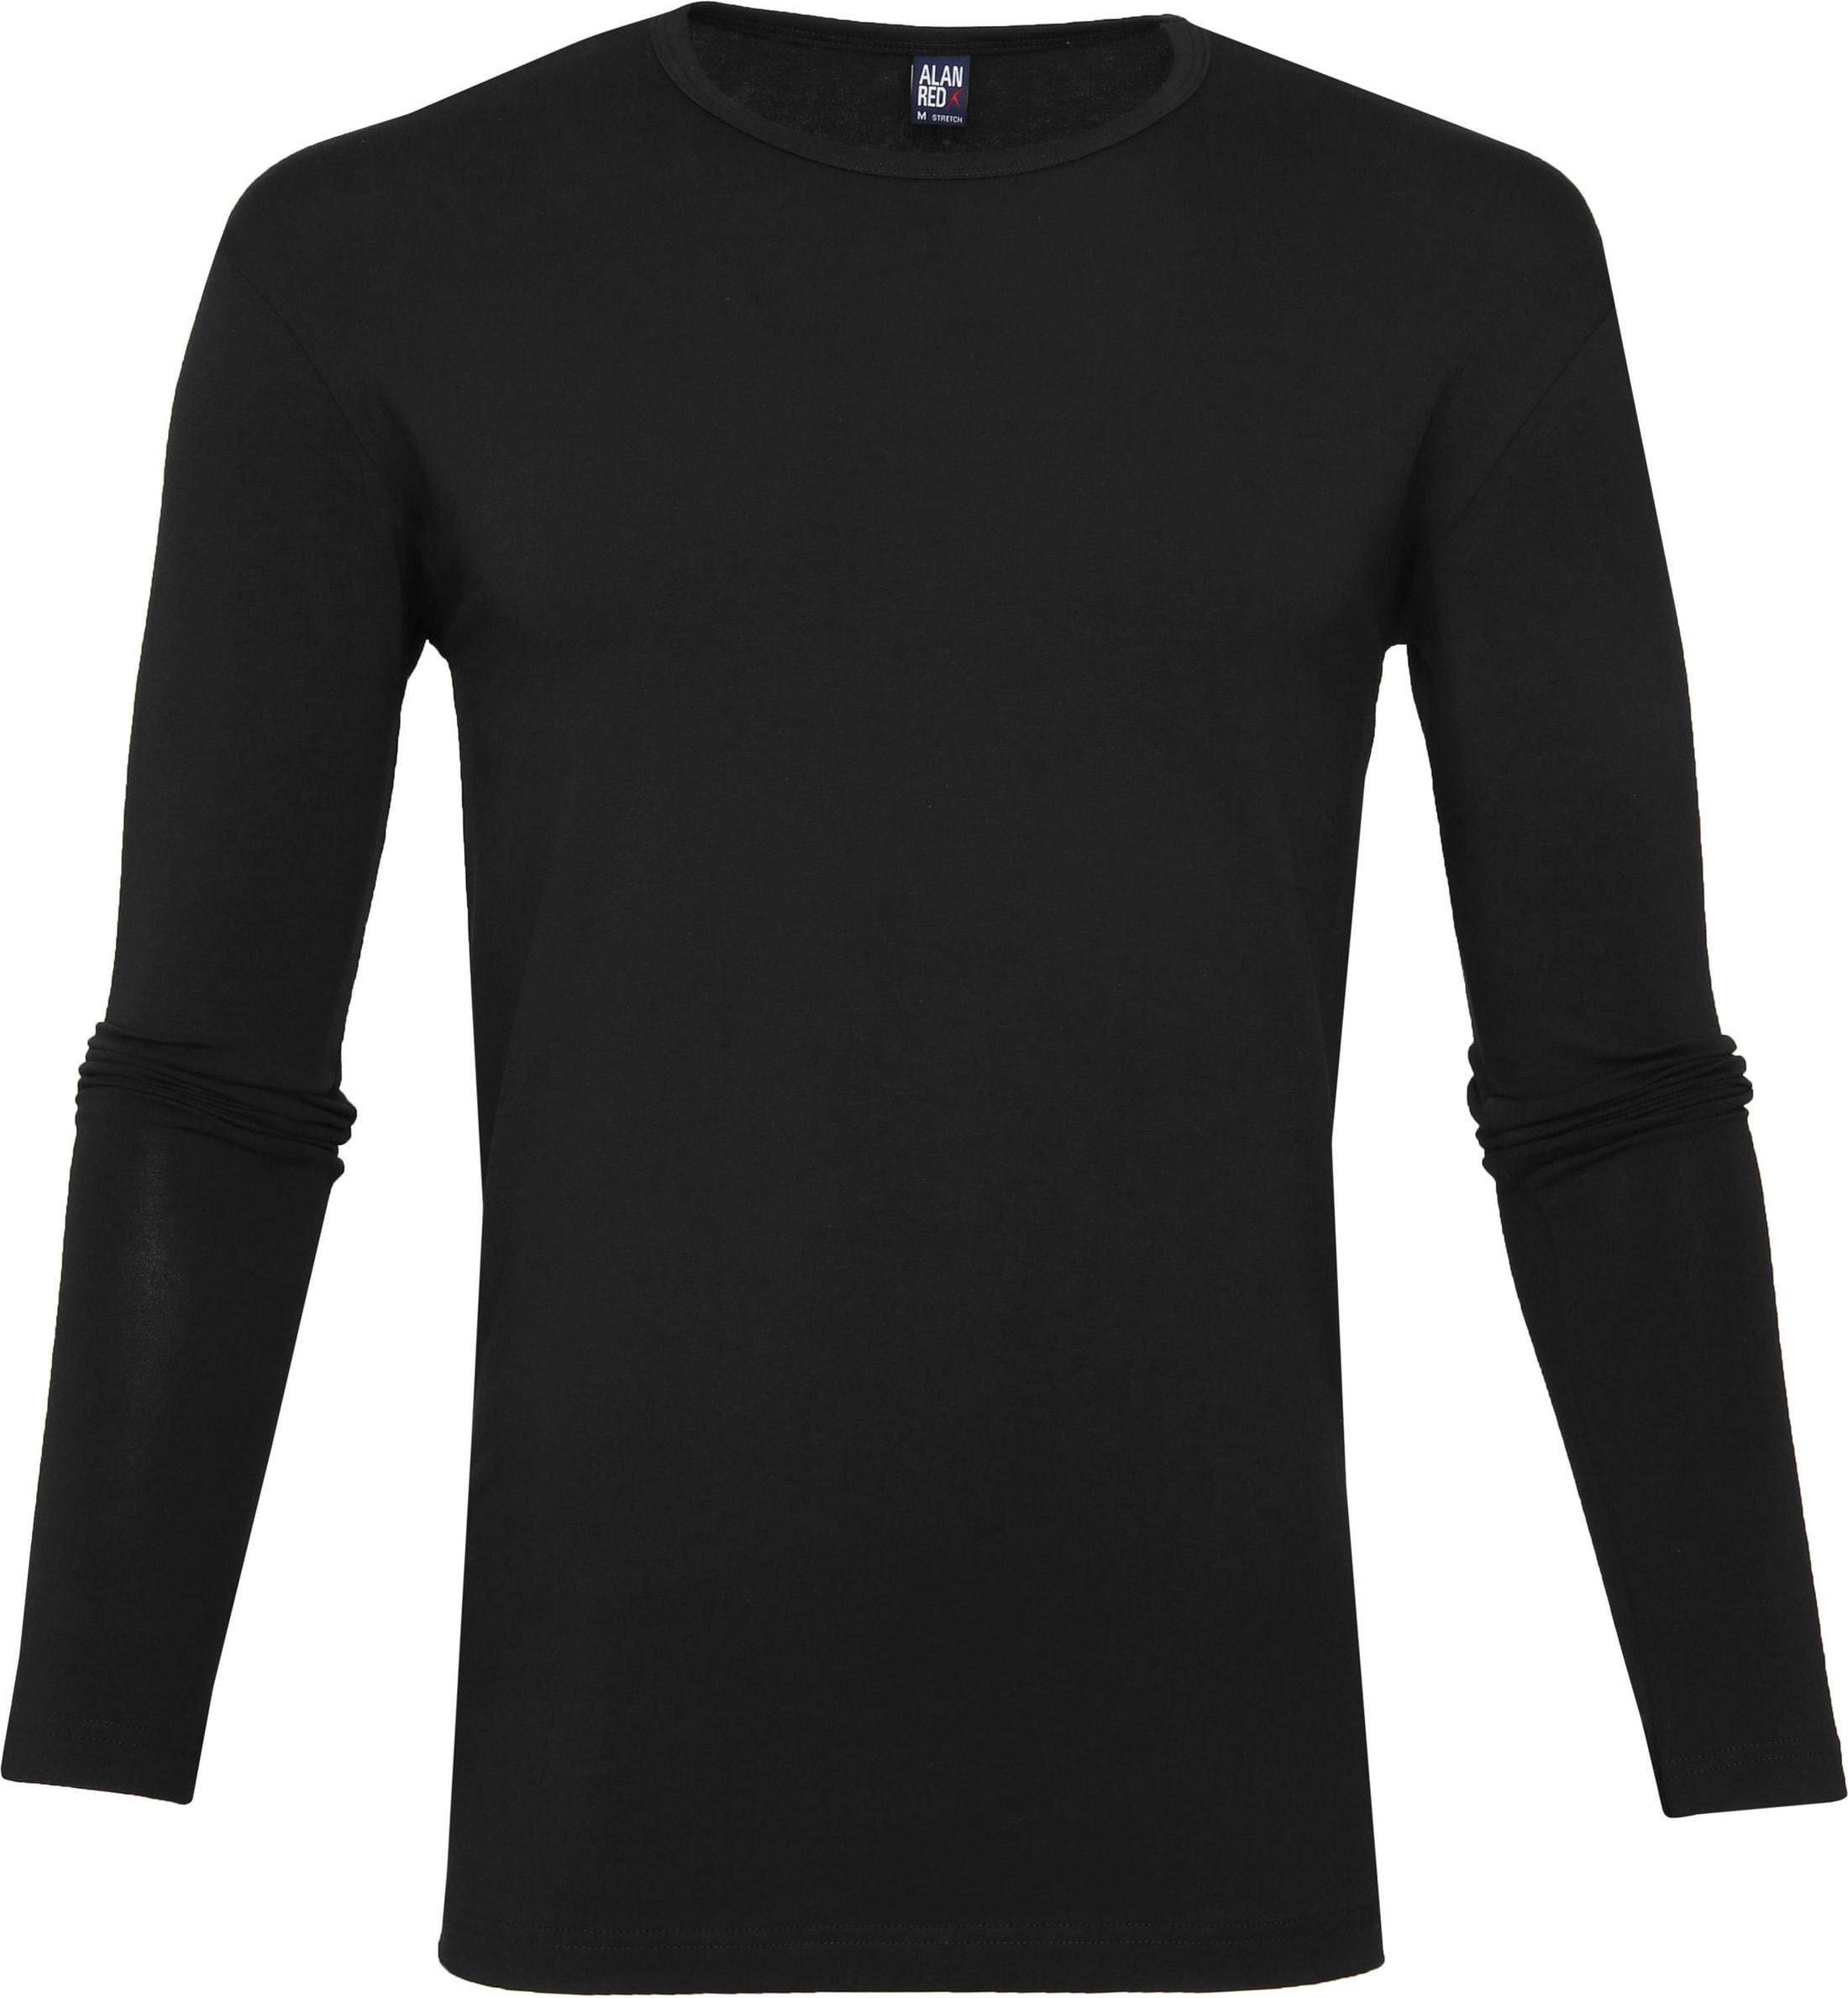 Alan Red Olbia Longsleeve T-shirt Black foto 0